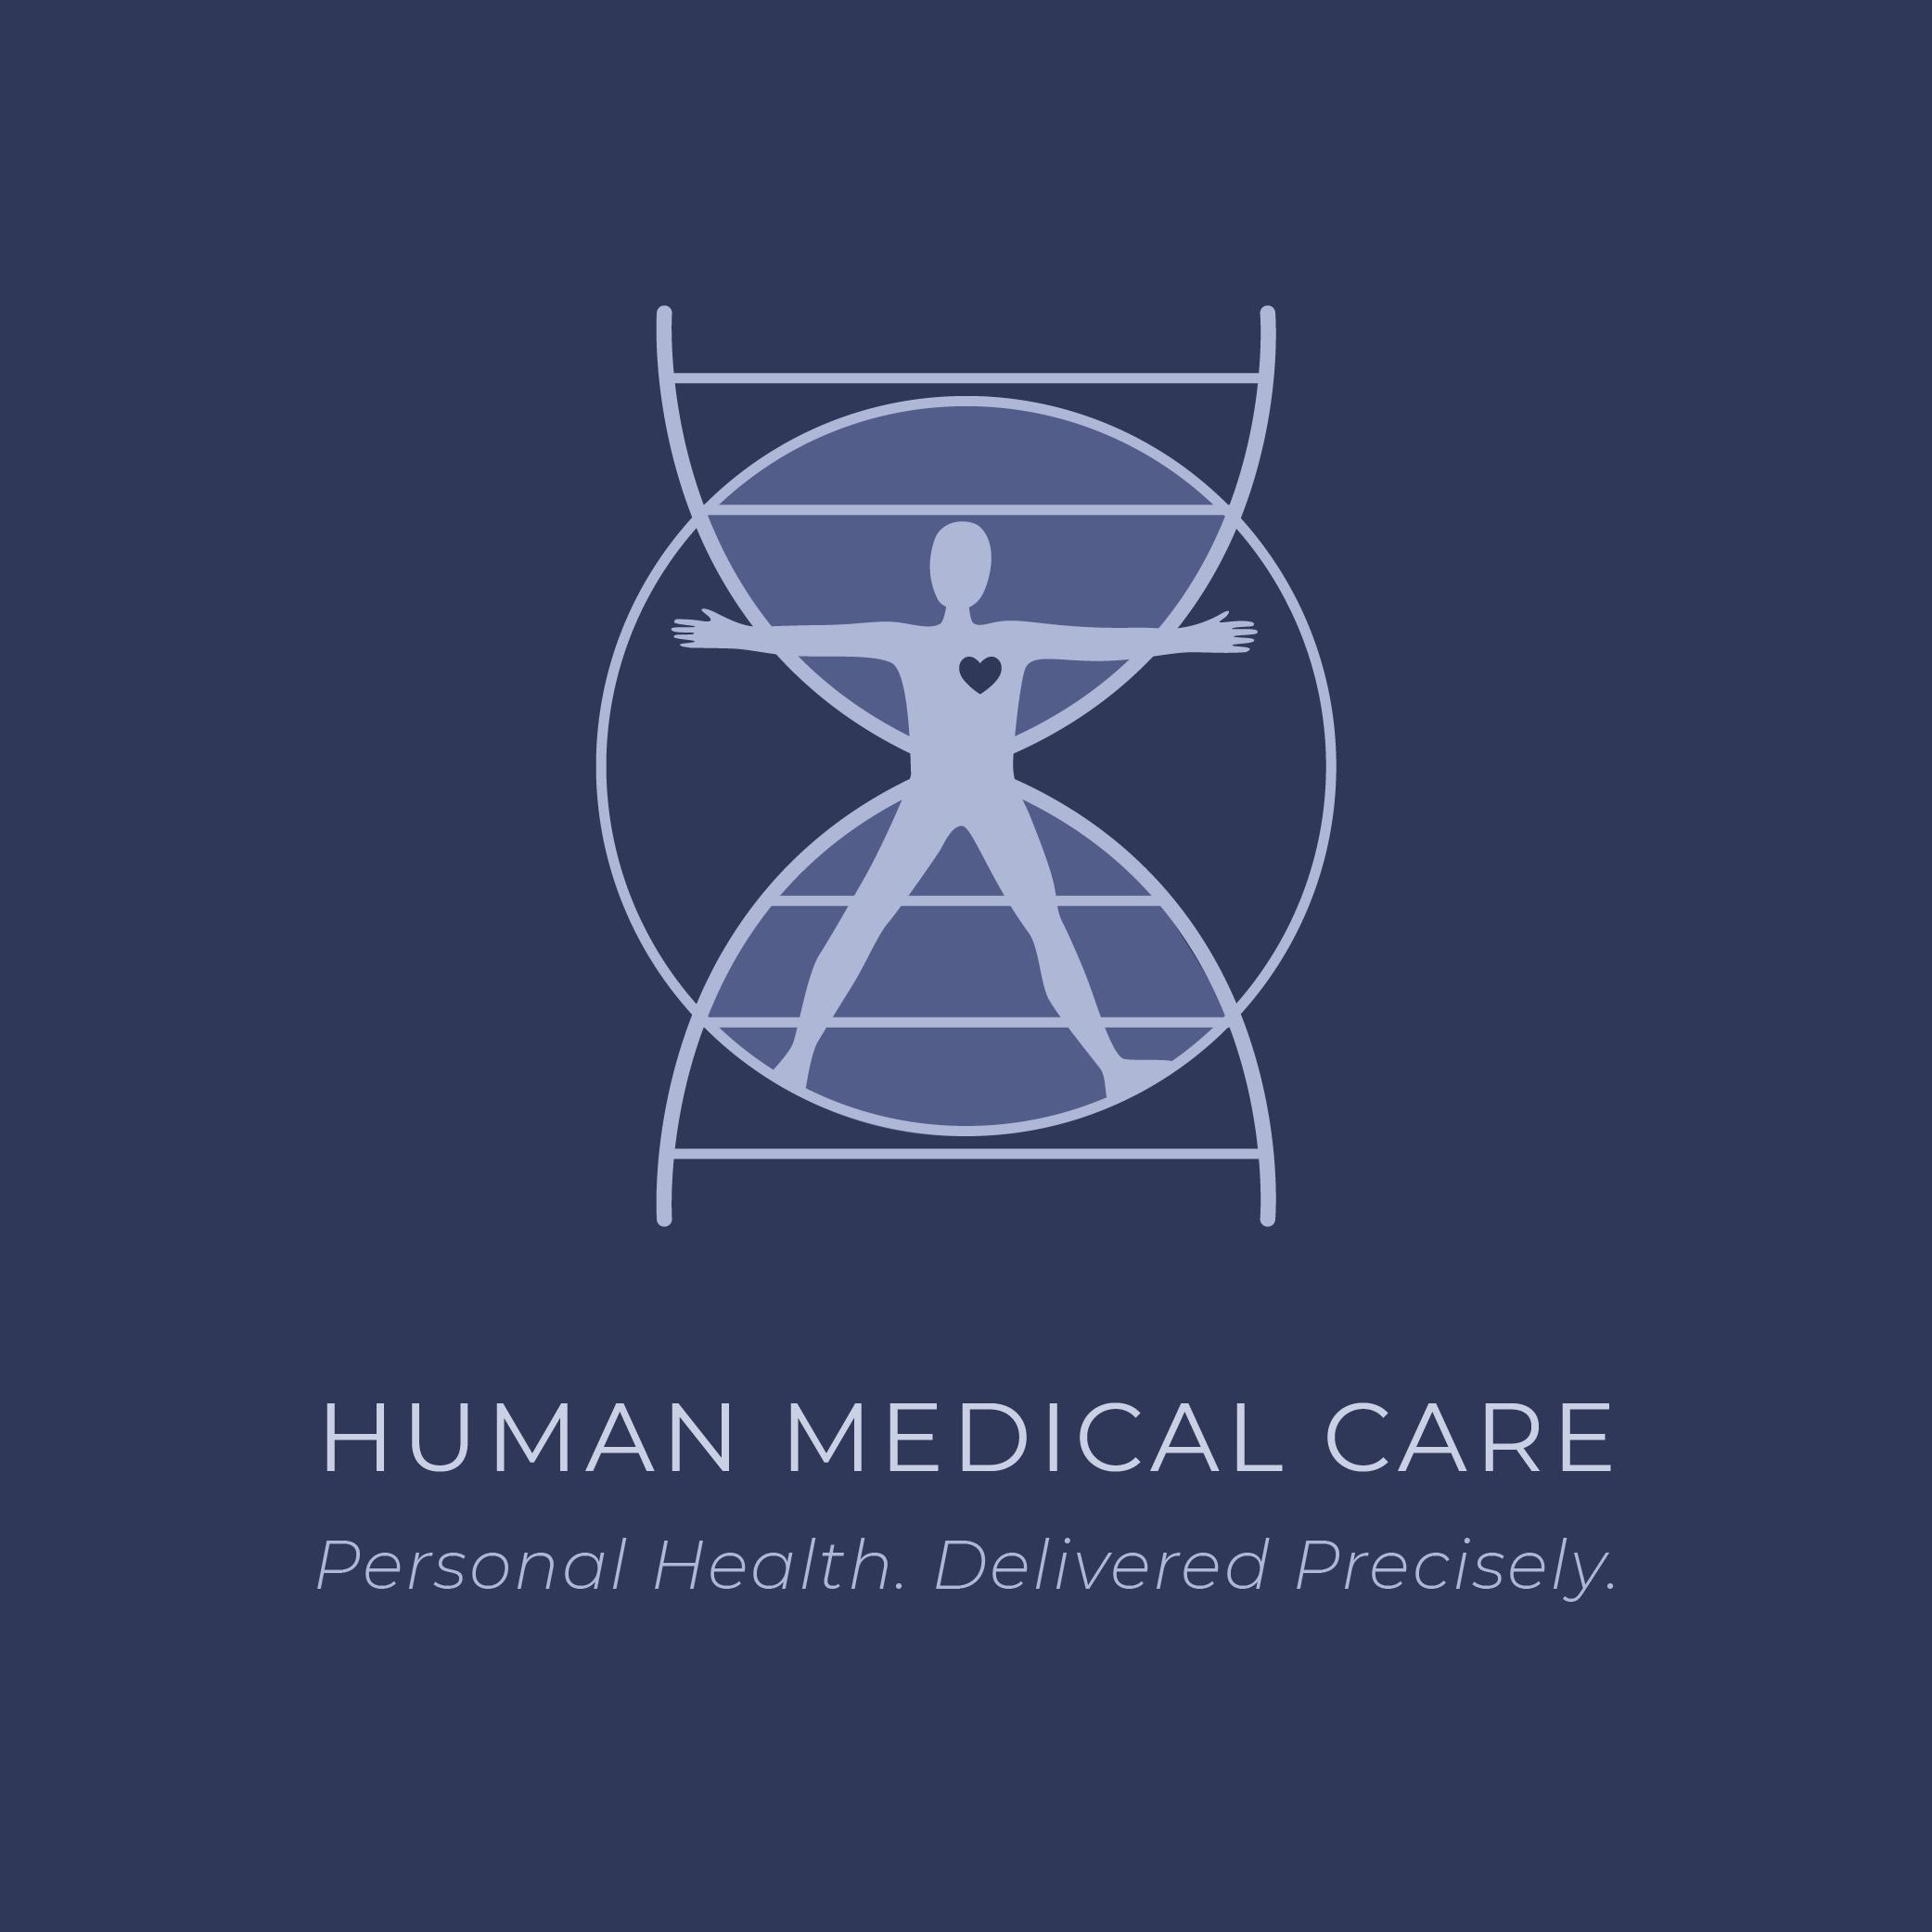 LOGO HUMAN MEDICAL CARE FINAL copy-01.jpg